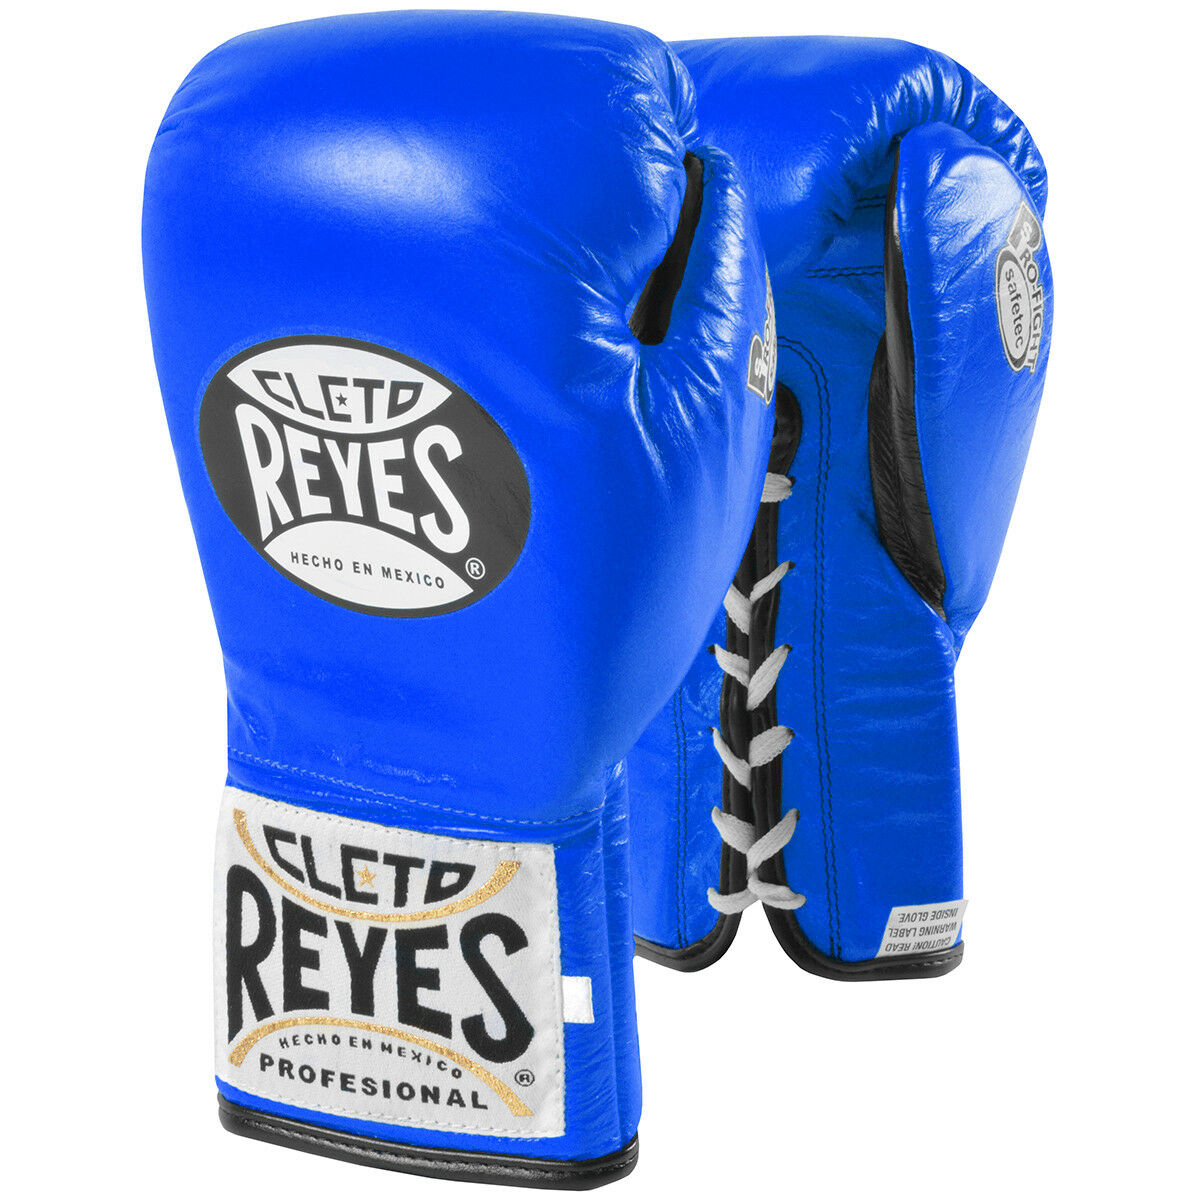 Cleto Reyes Safetec Professionelle Boxhandschuhe - Blau